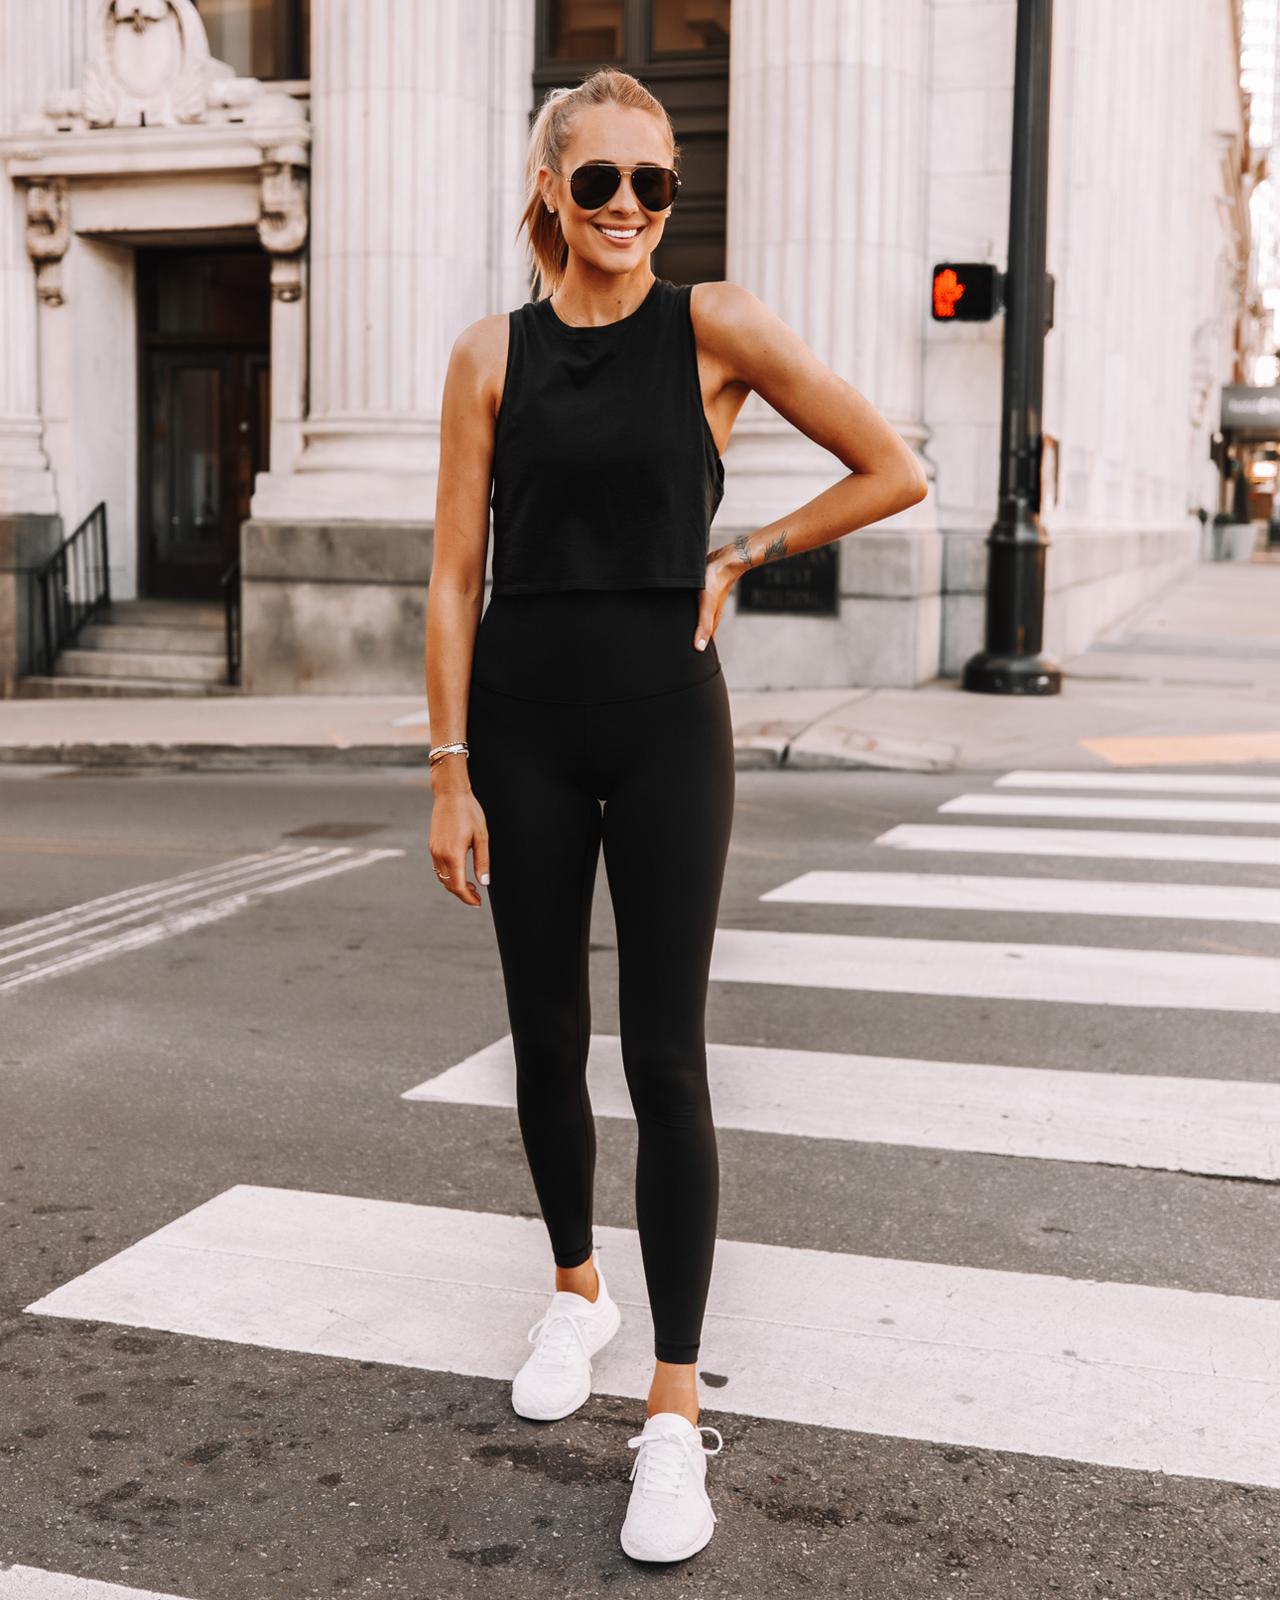 Fashion Jackson Wearing lululemon black tank wunder under leggings white APL sneakers fitness outfit